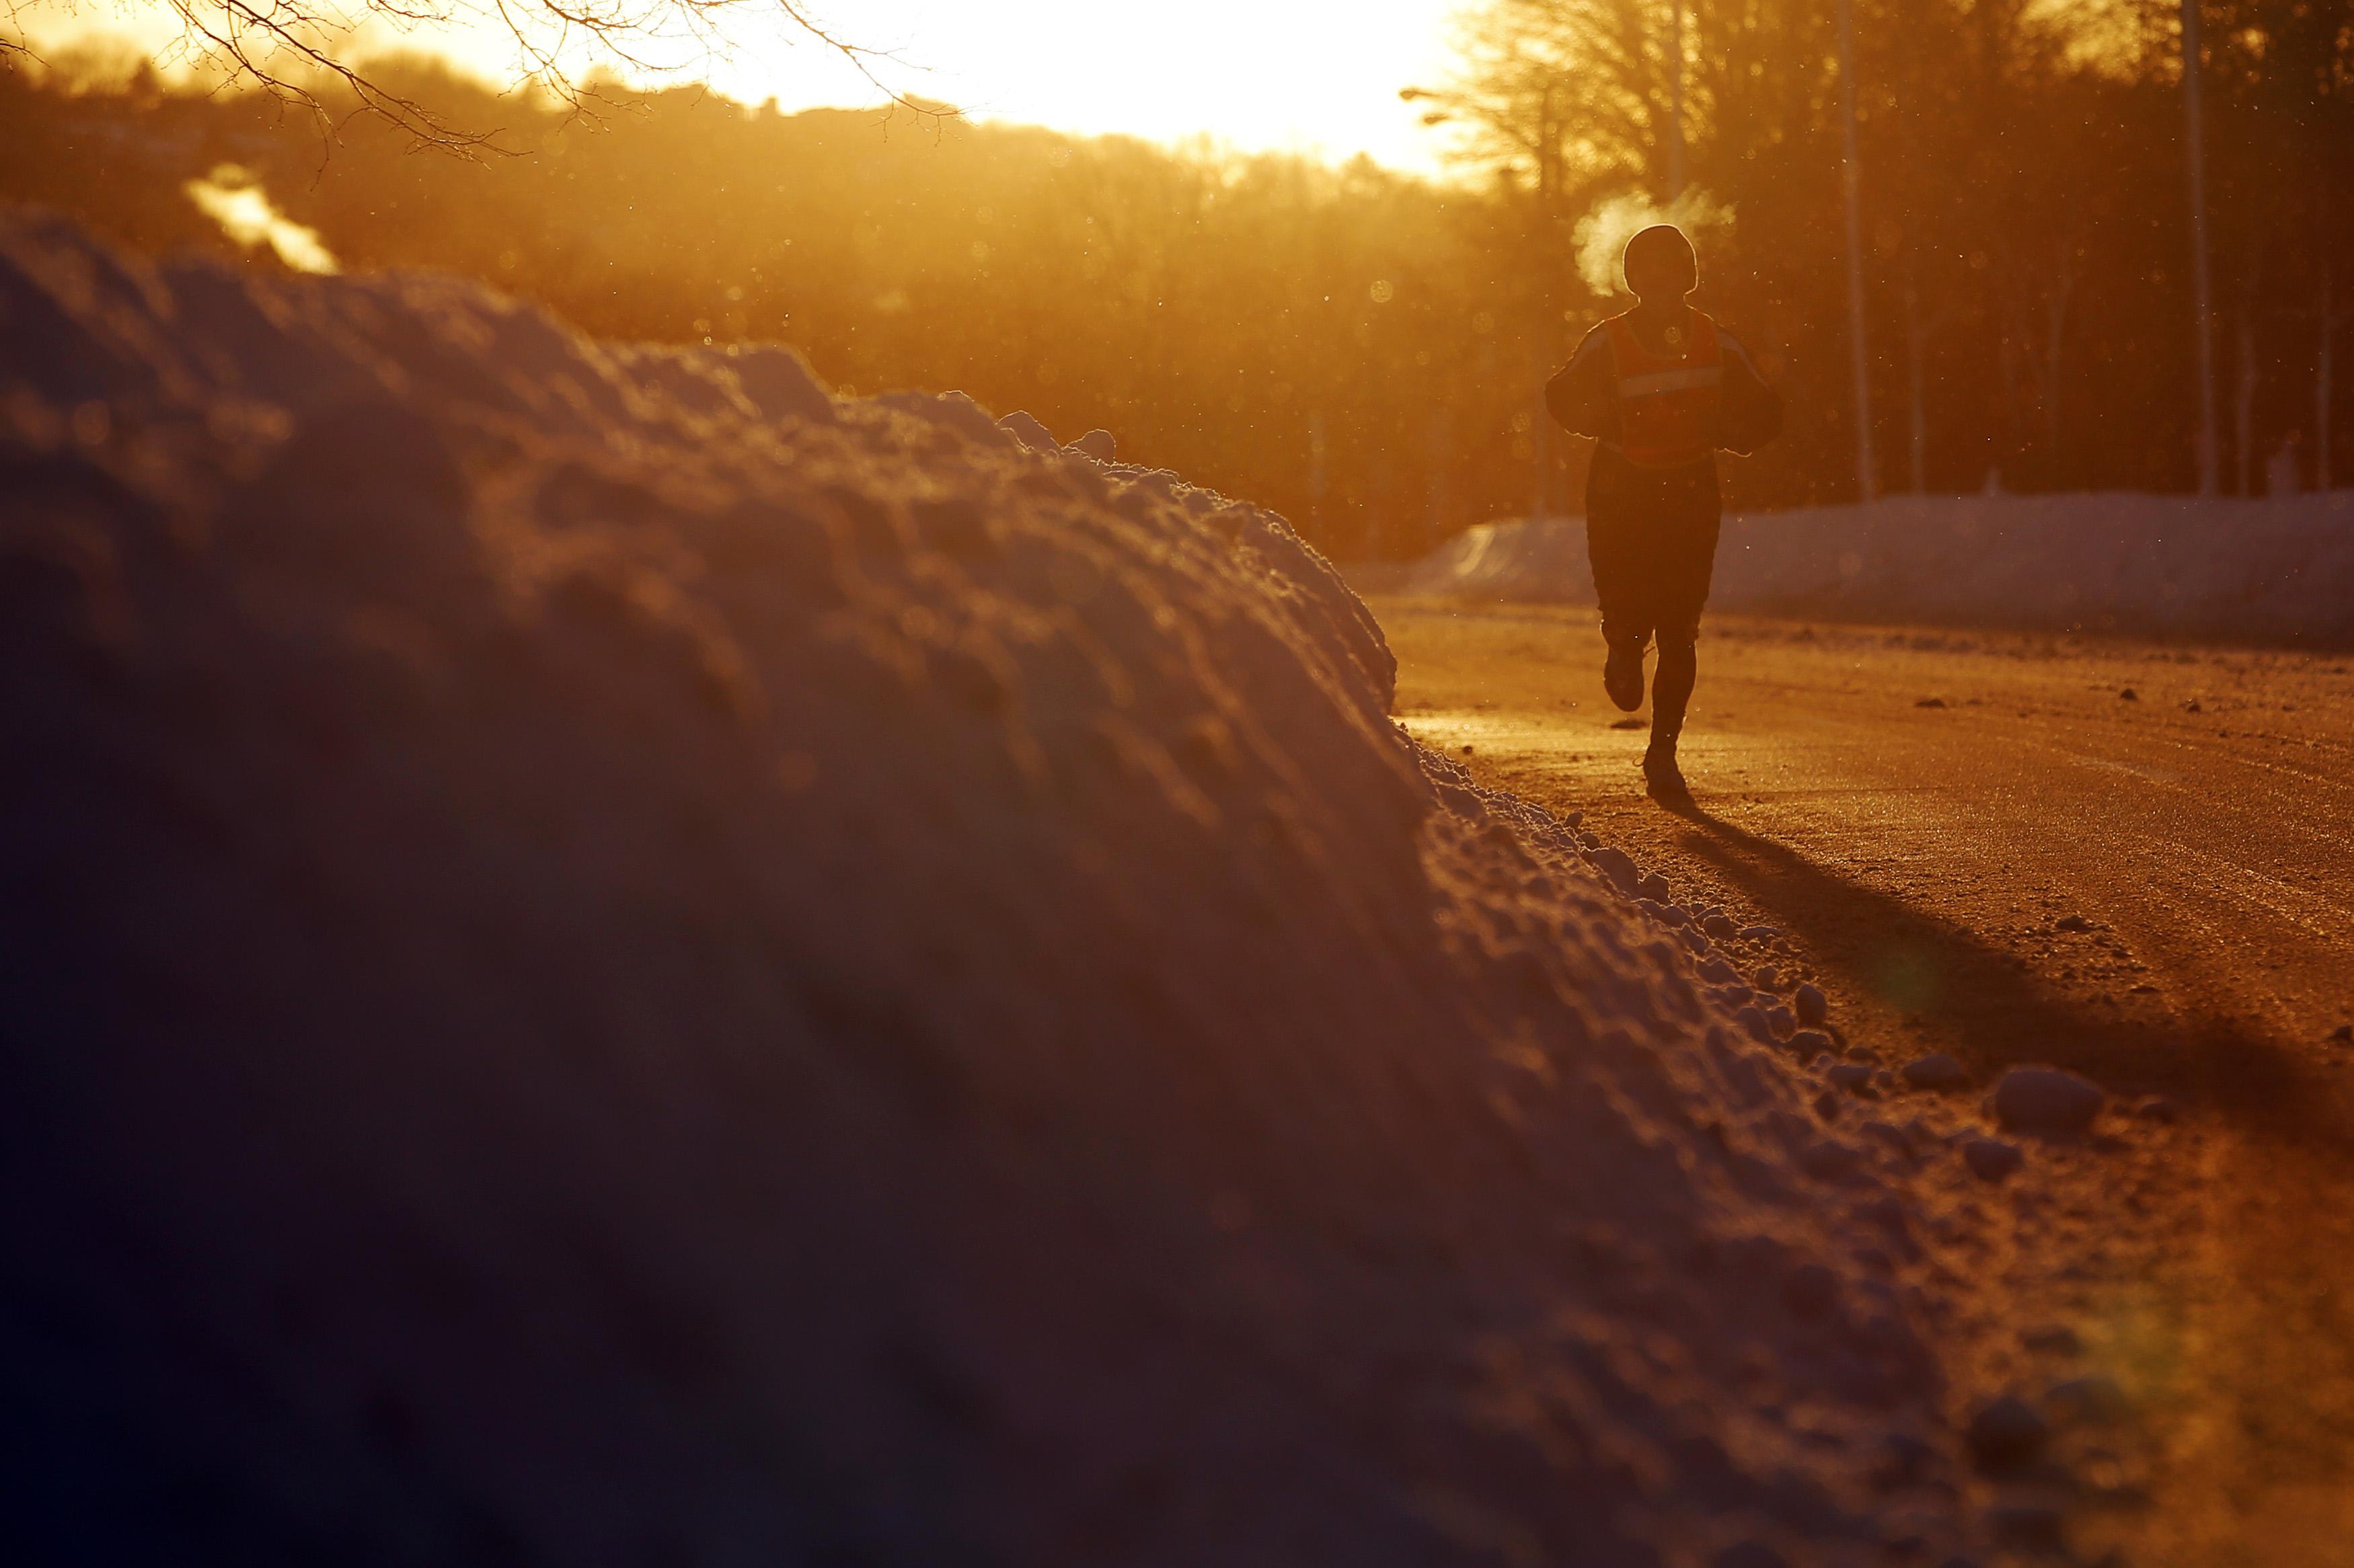 A jogger runs along Memorial Drive in Cambridge, Massachusetts. (Photo: REUTERS/Brian Snyder)